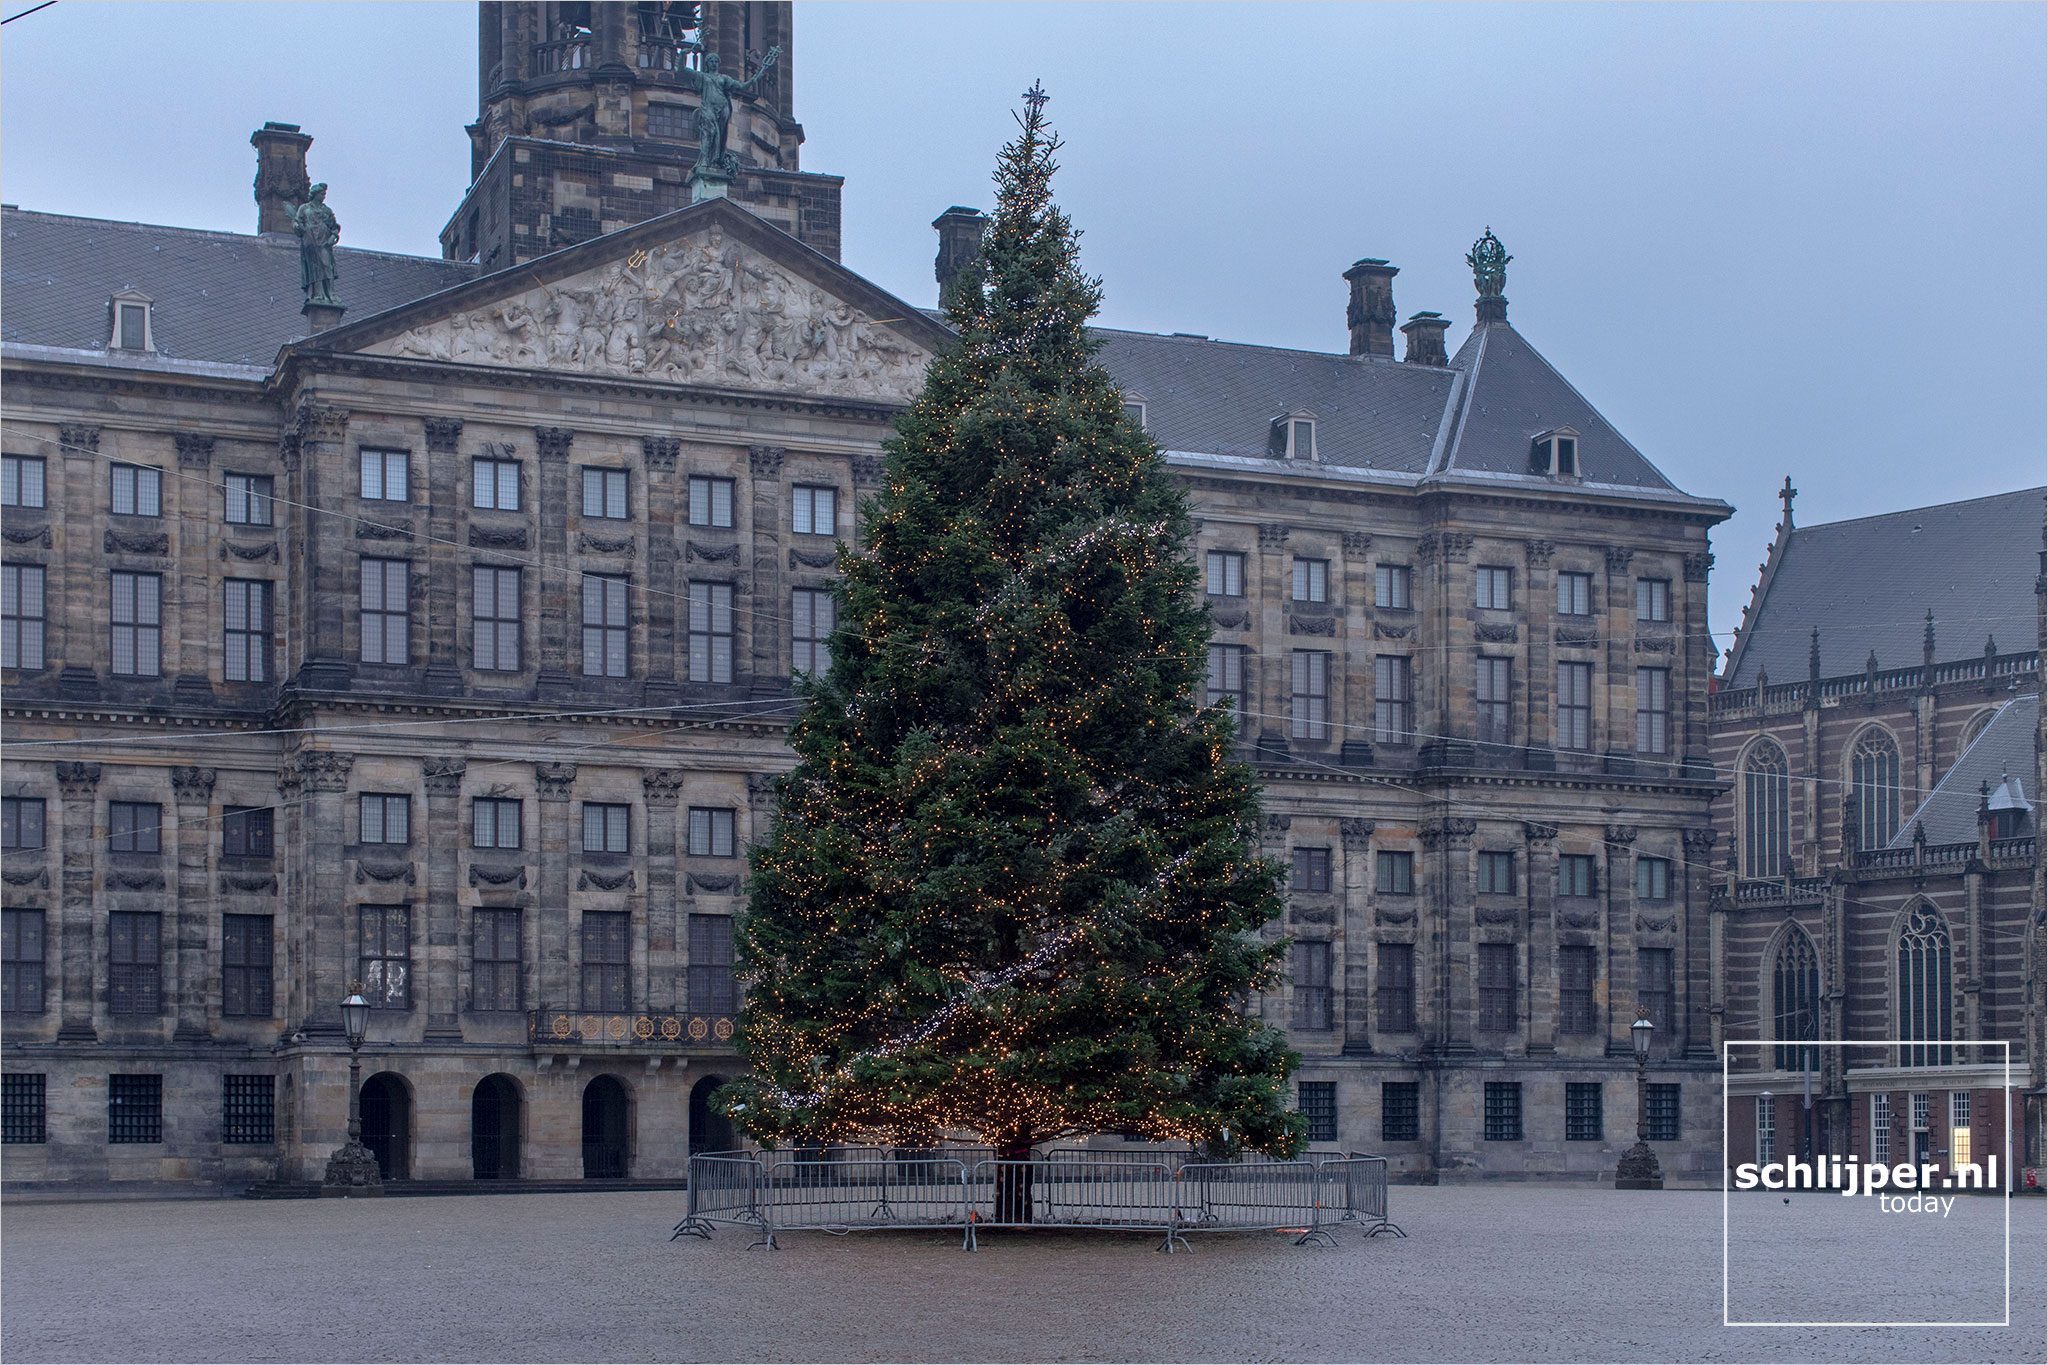 The Netherlands, Amsterdam, 23 december 2020